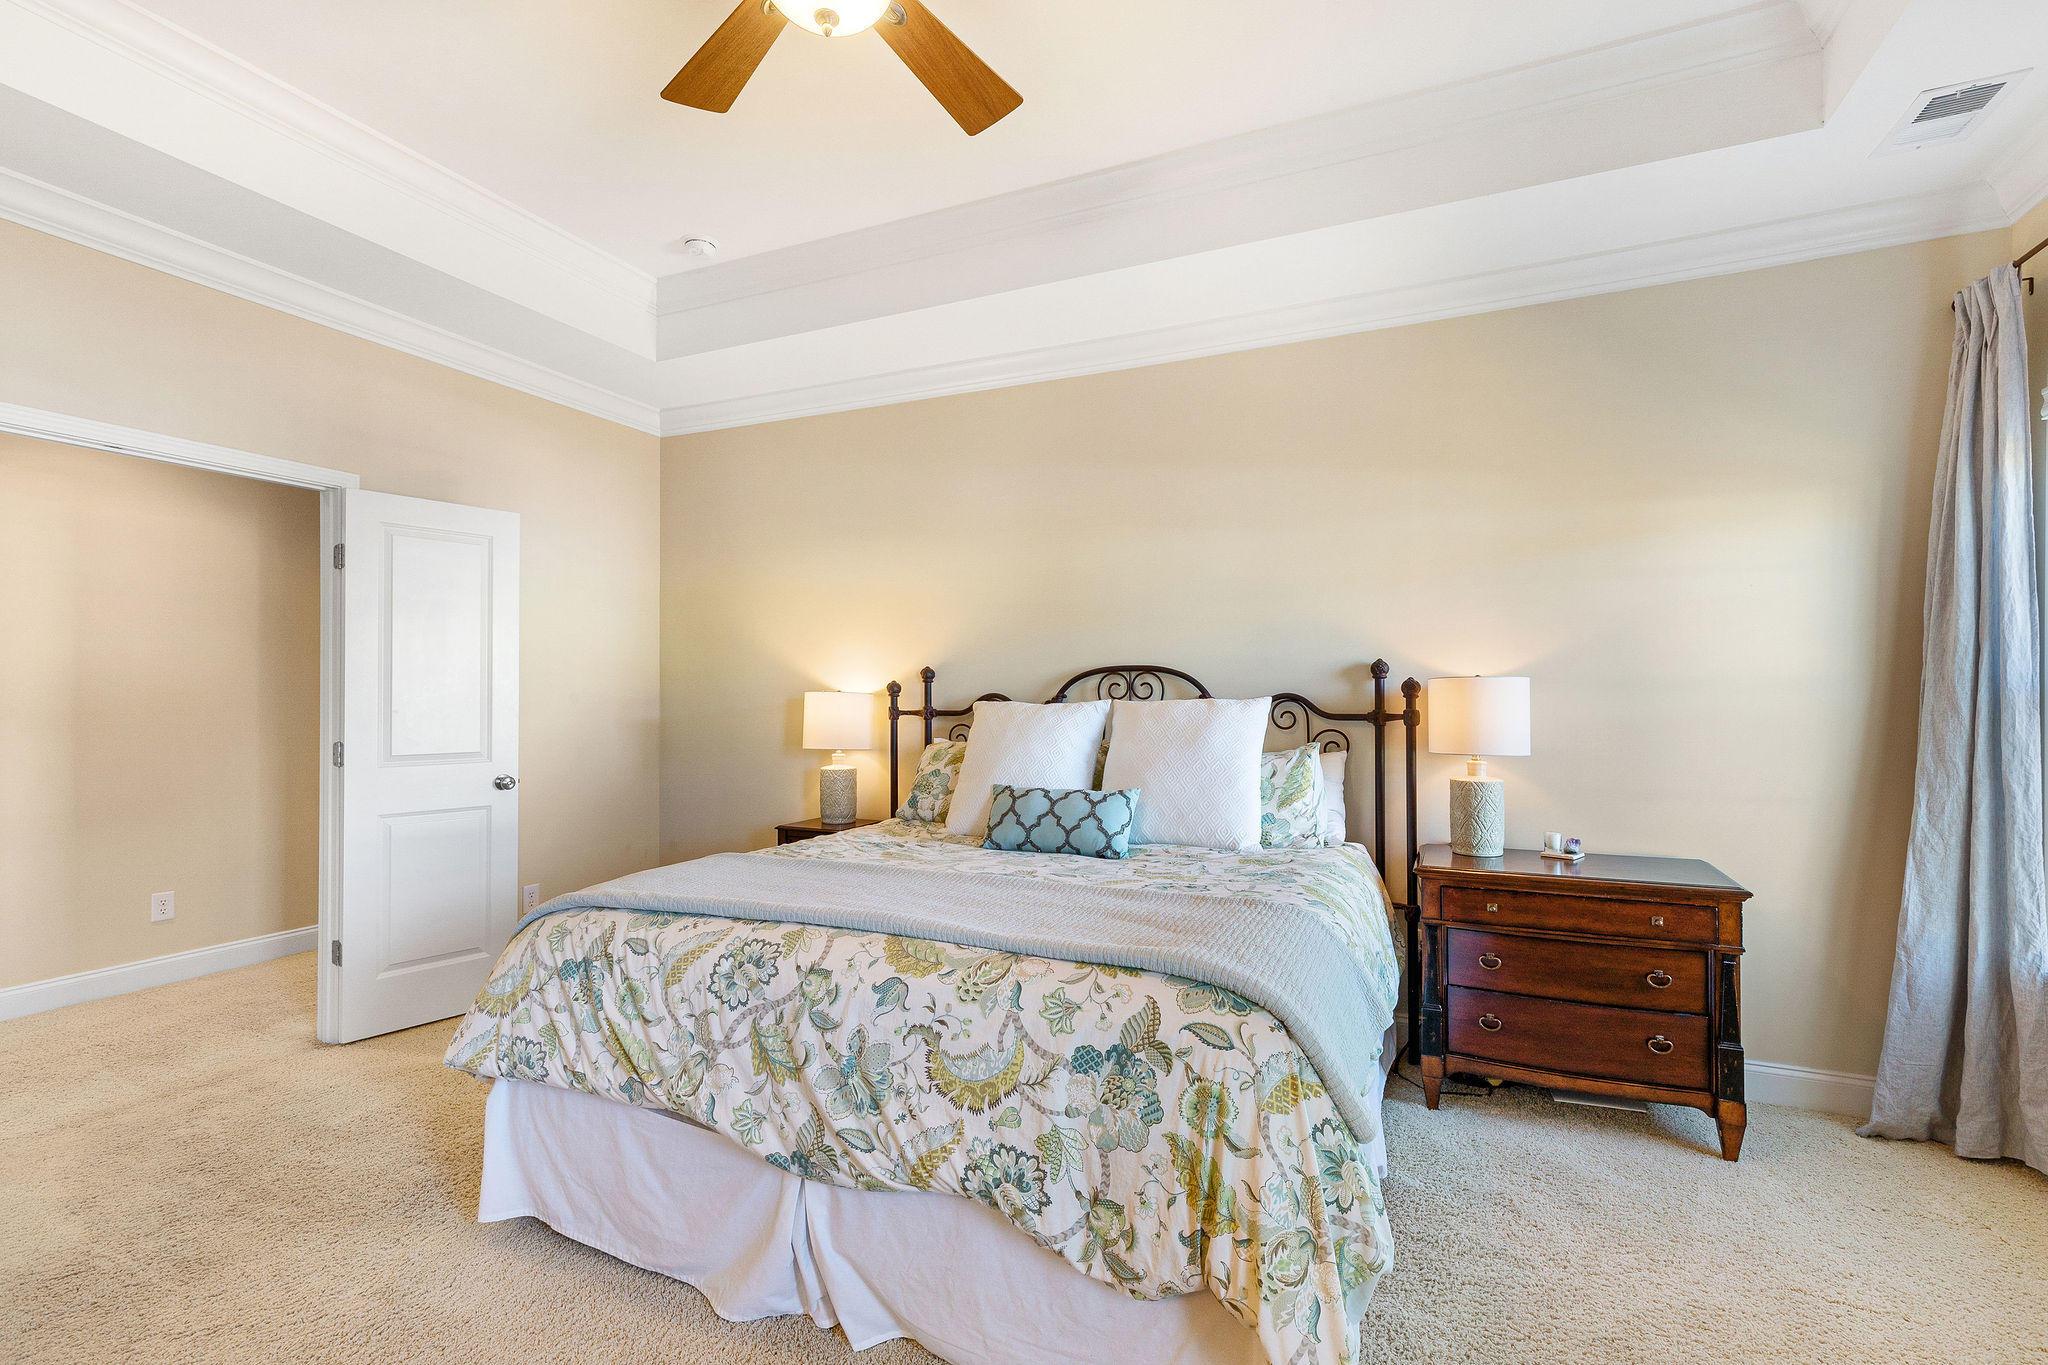 Dunes West Homes For Sale - 3212 Hatchway, Mount Pleasant, SC - 7